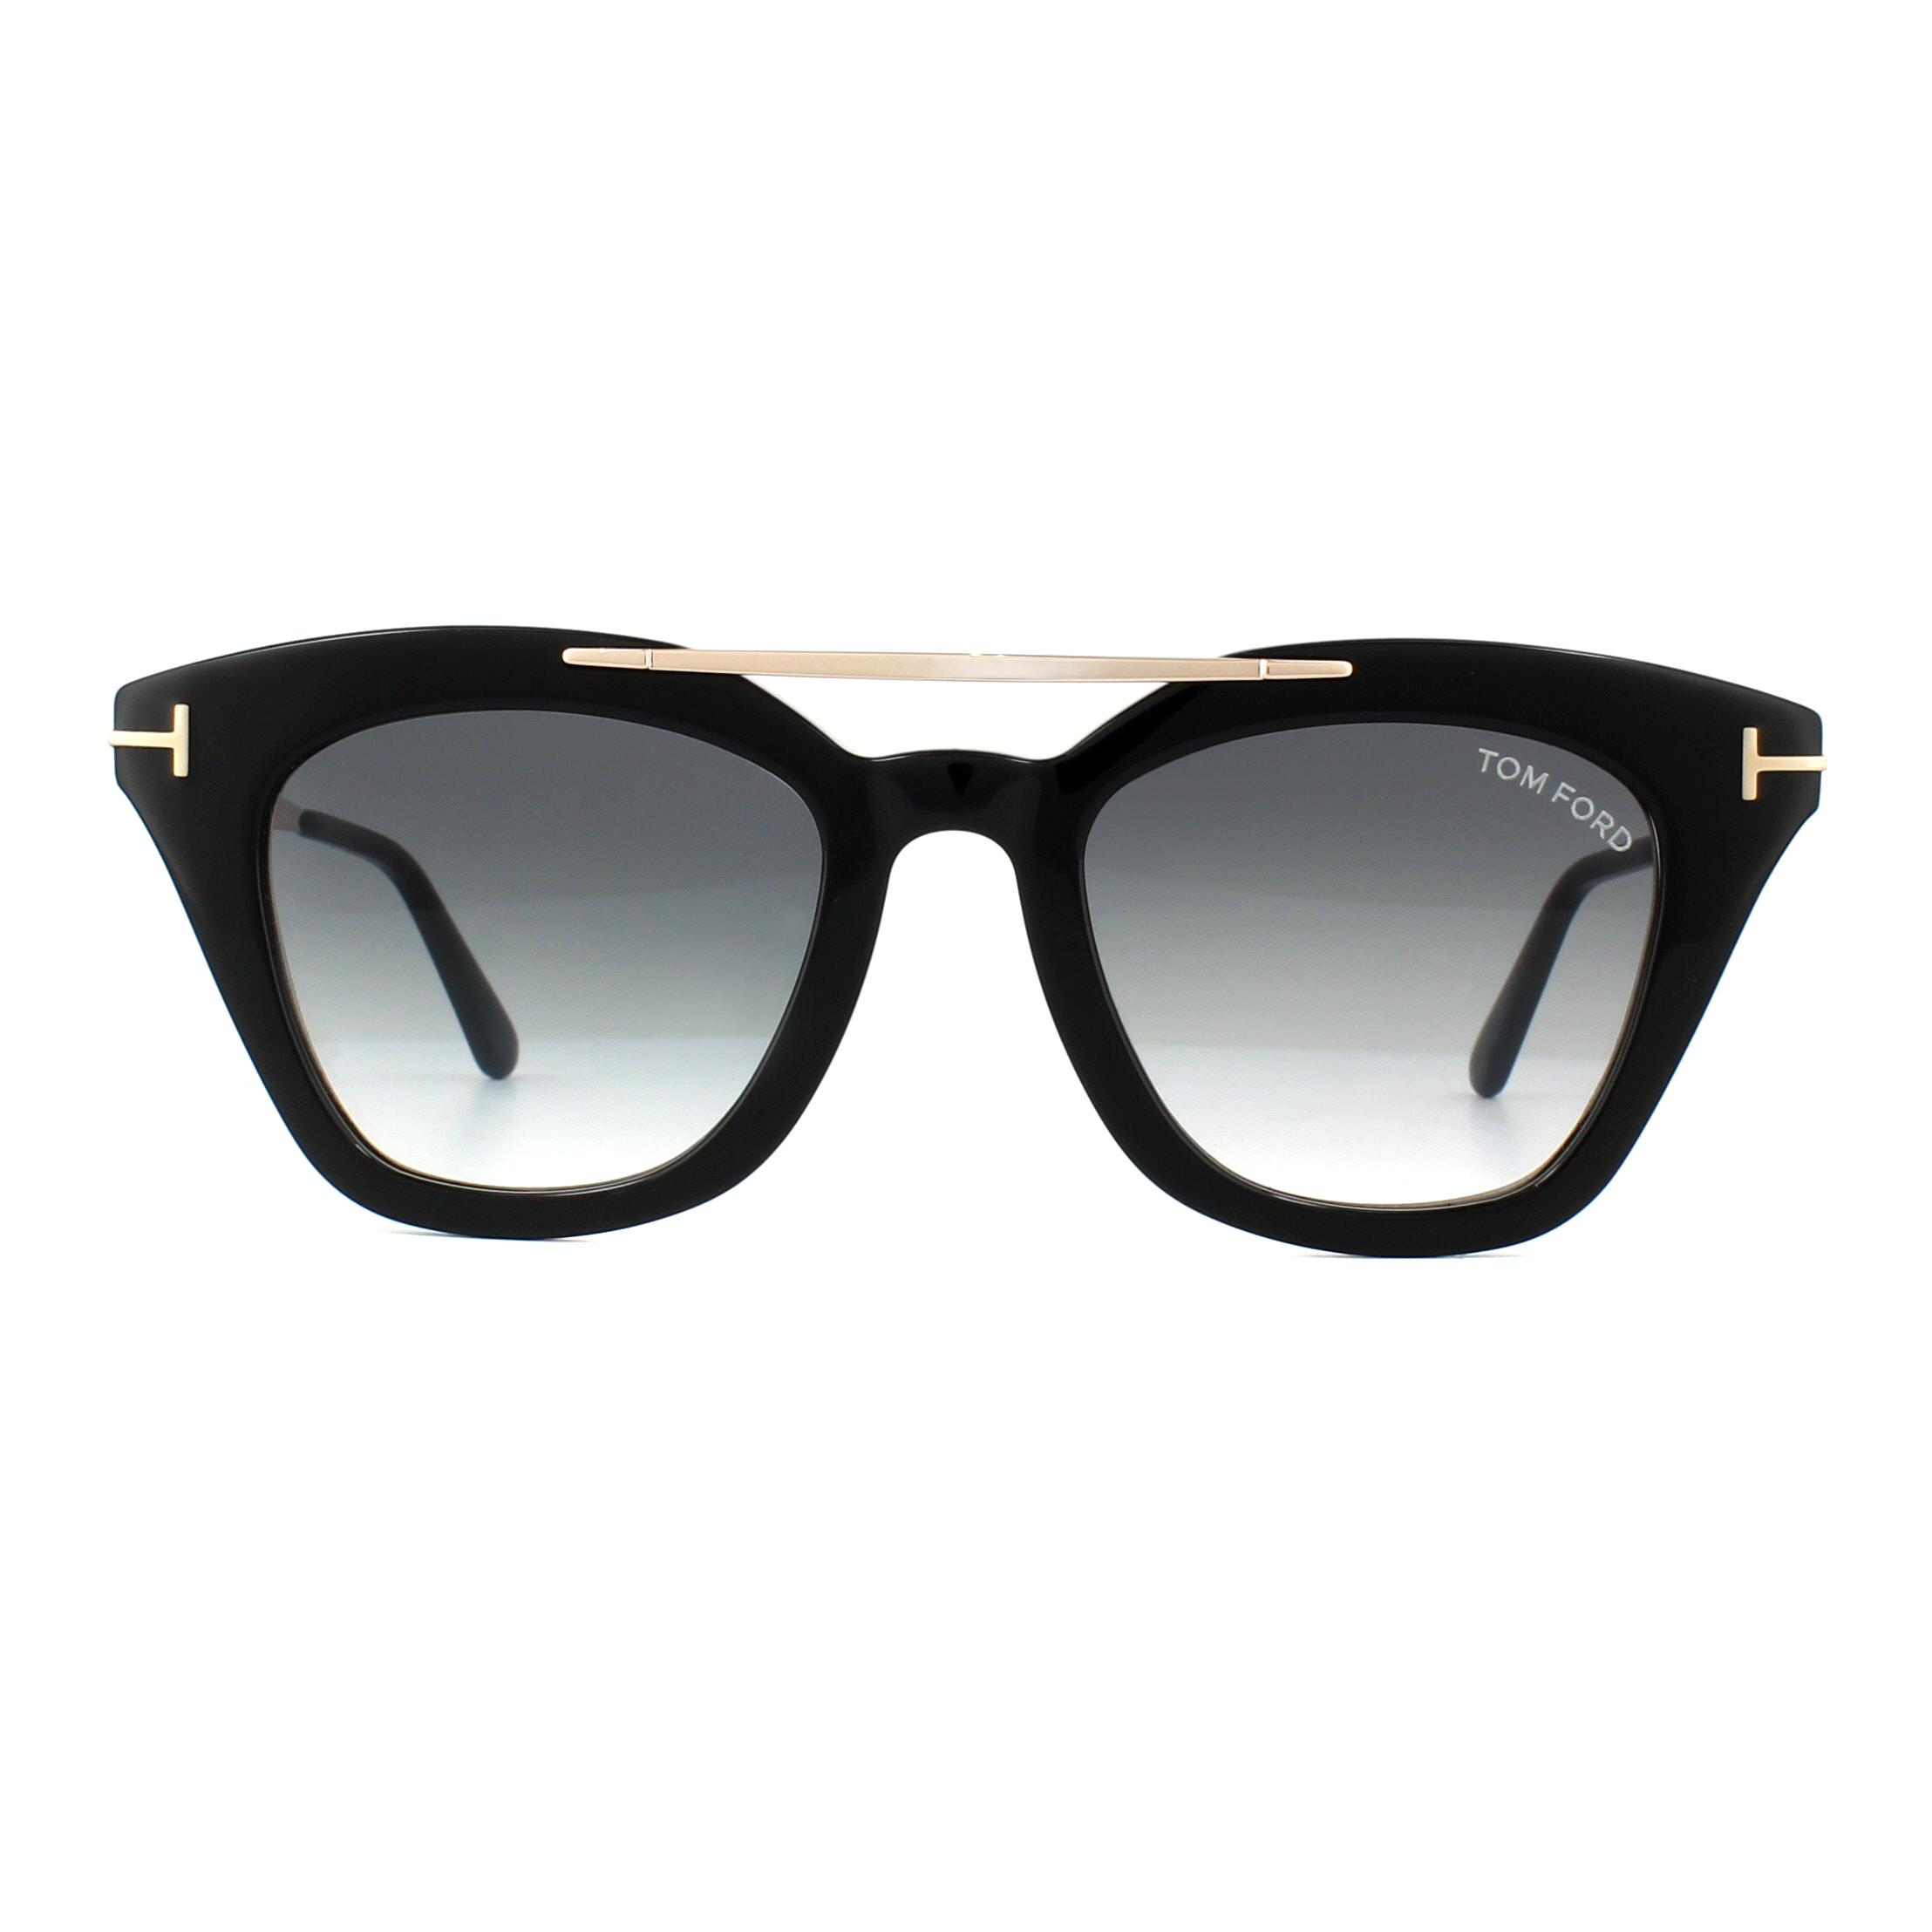 5c7db3b6d91 Sentinel Tom Ford Sunglasses 0575 Anna 01B Shiny Black Grey Gradient